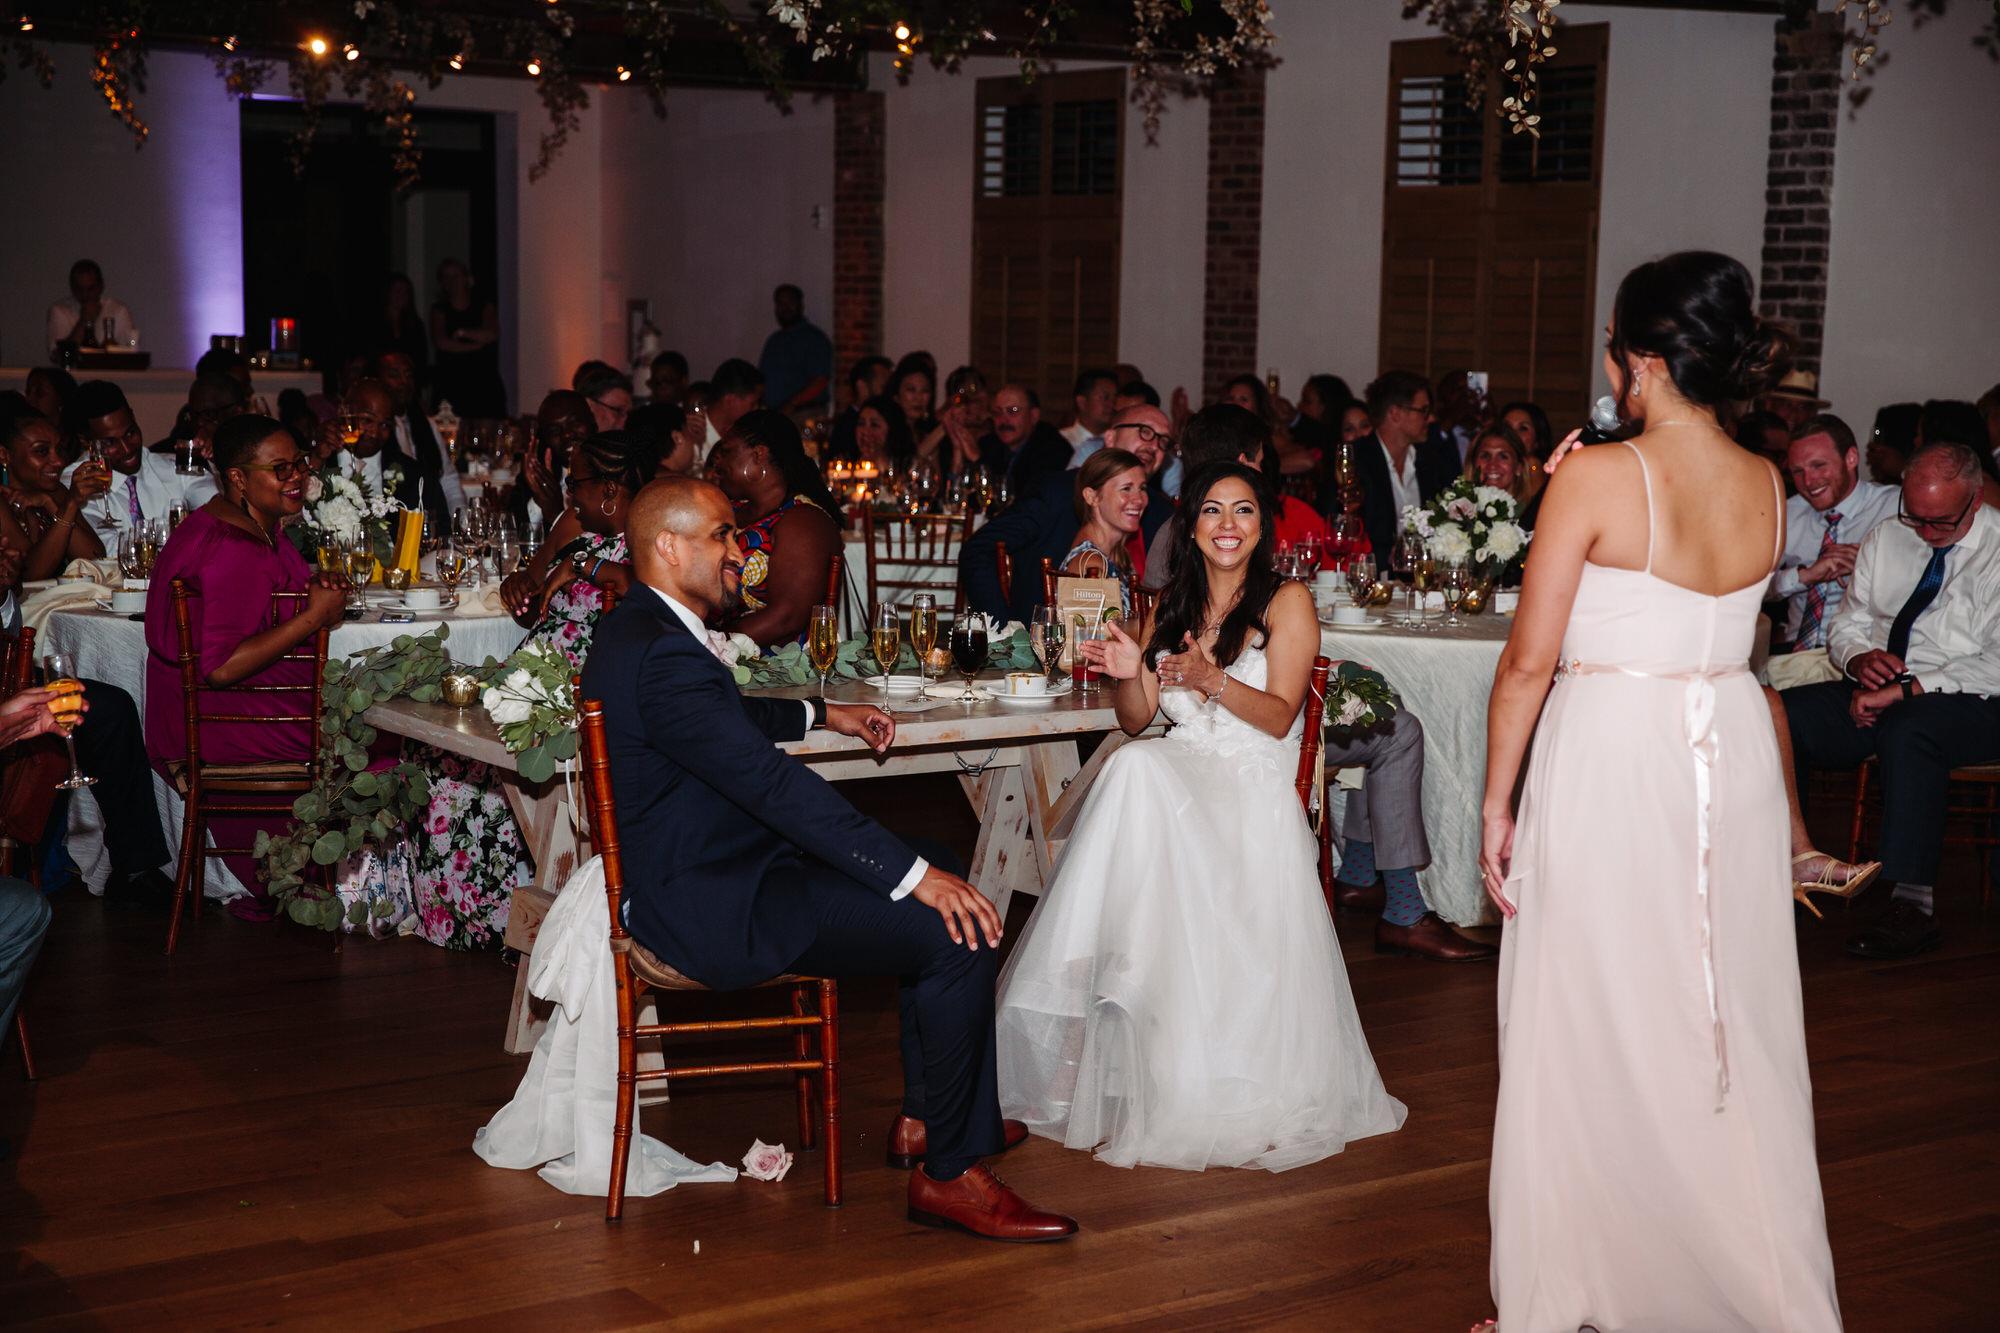 st-lukes-chapel-cannon-green-charleston-wedding-1016.JPG